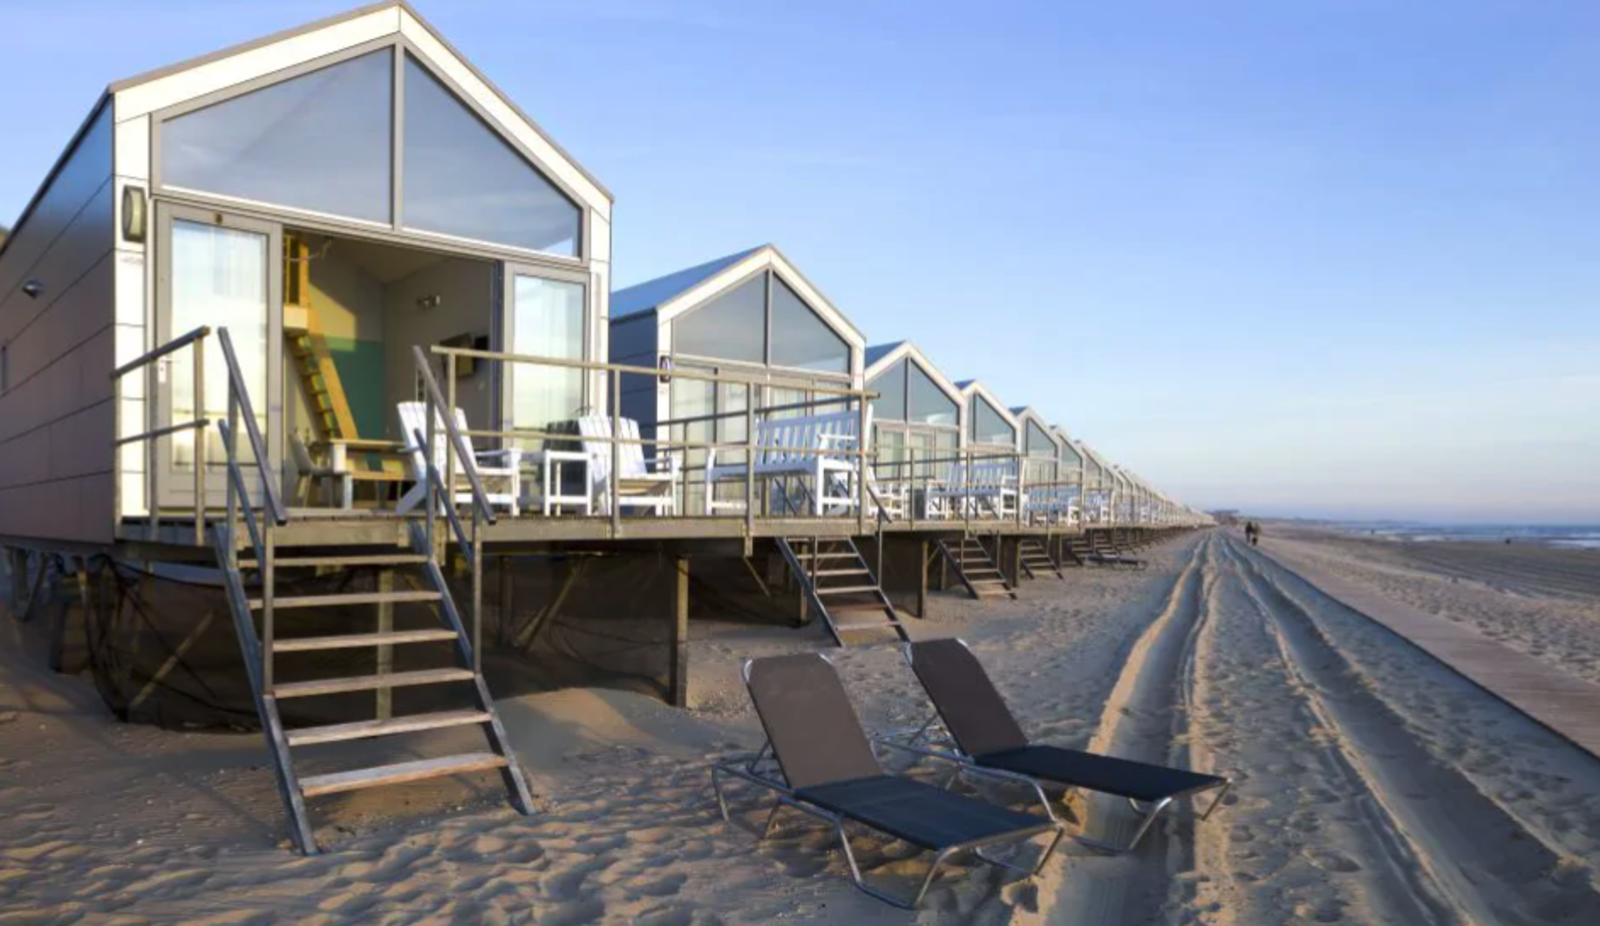 Noord-Holland, Roompot, Strandhuisjes Julianadorp